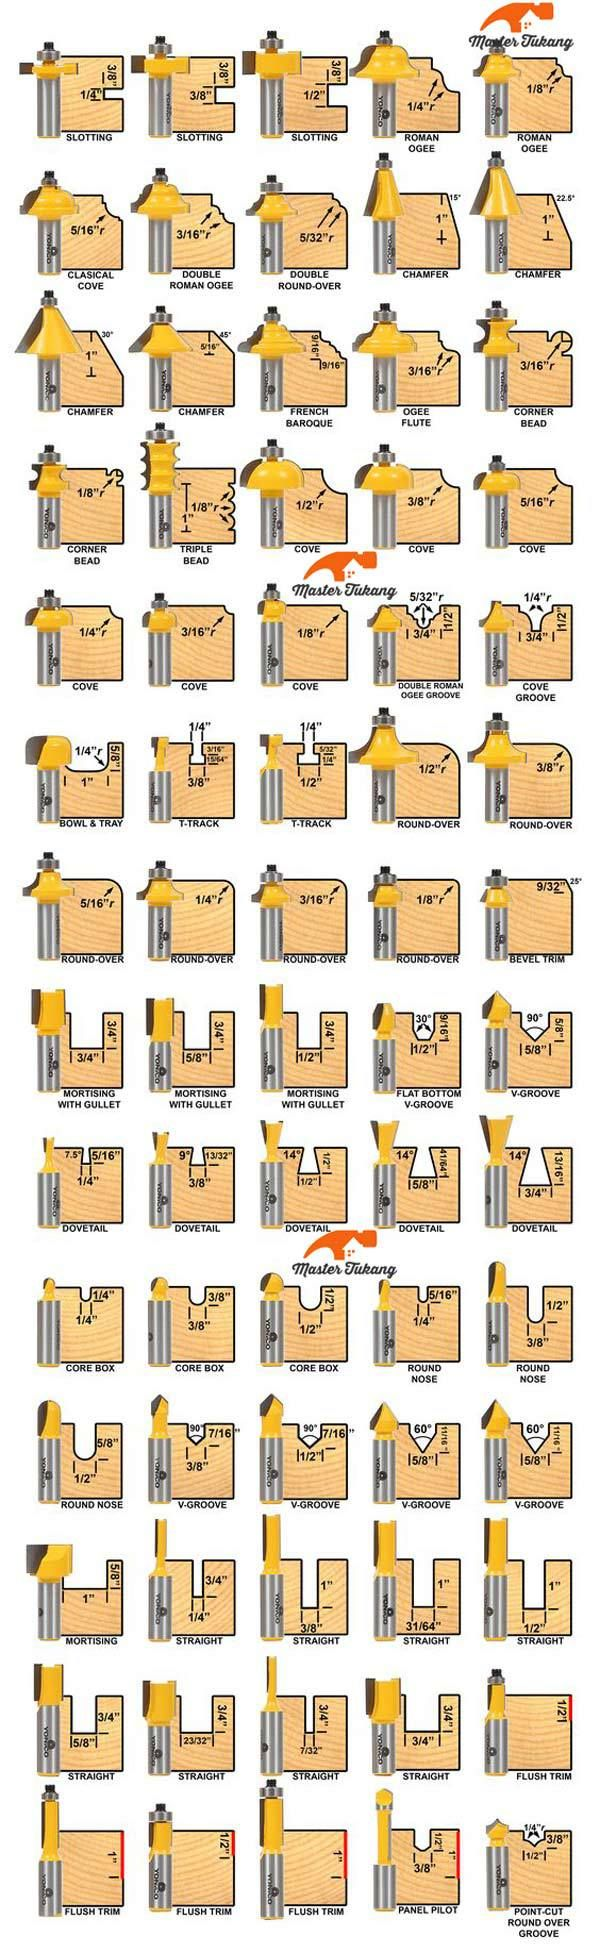 Jenis Jenis Power Tools : jenis, power, tools, Berbagi, Jenis, Profil, Router, Router,